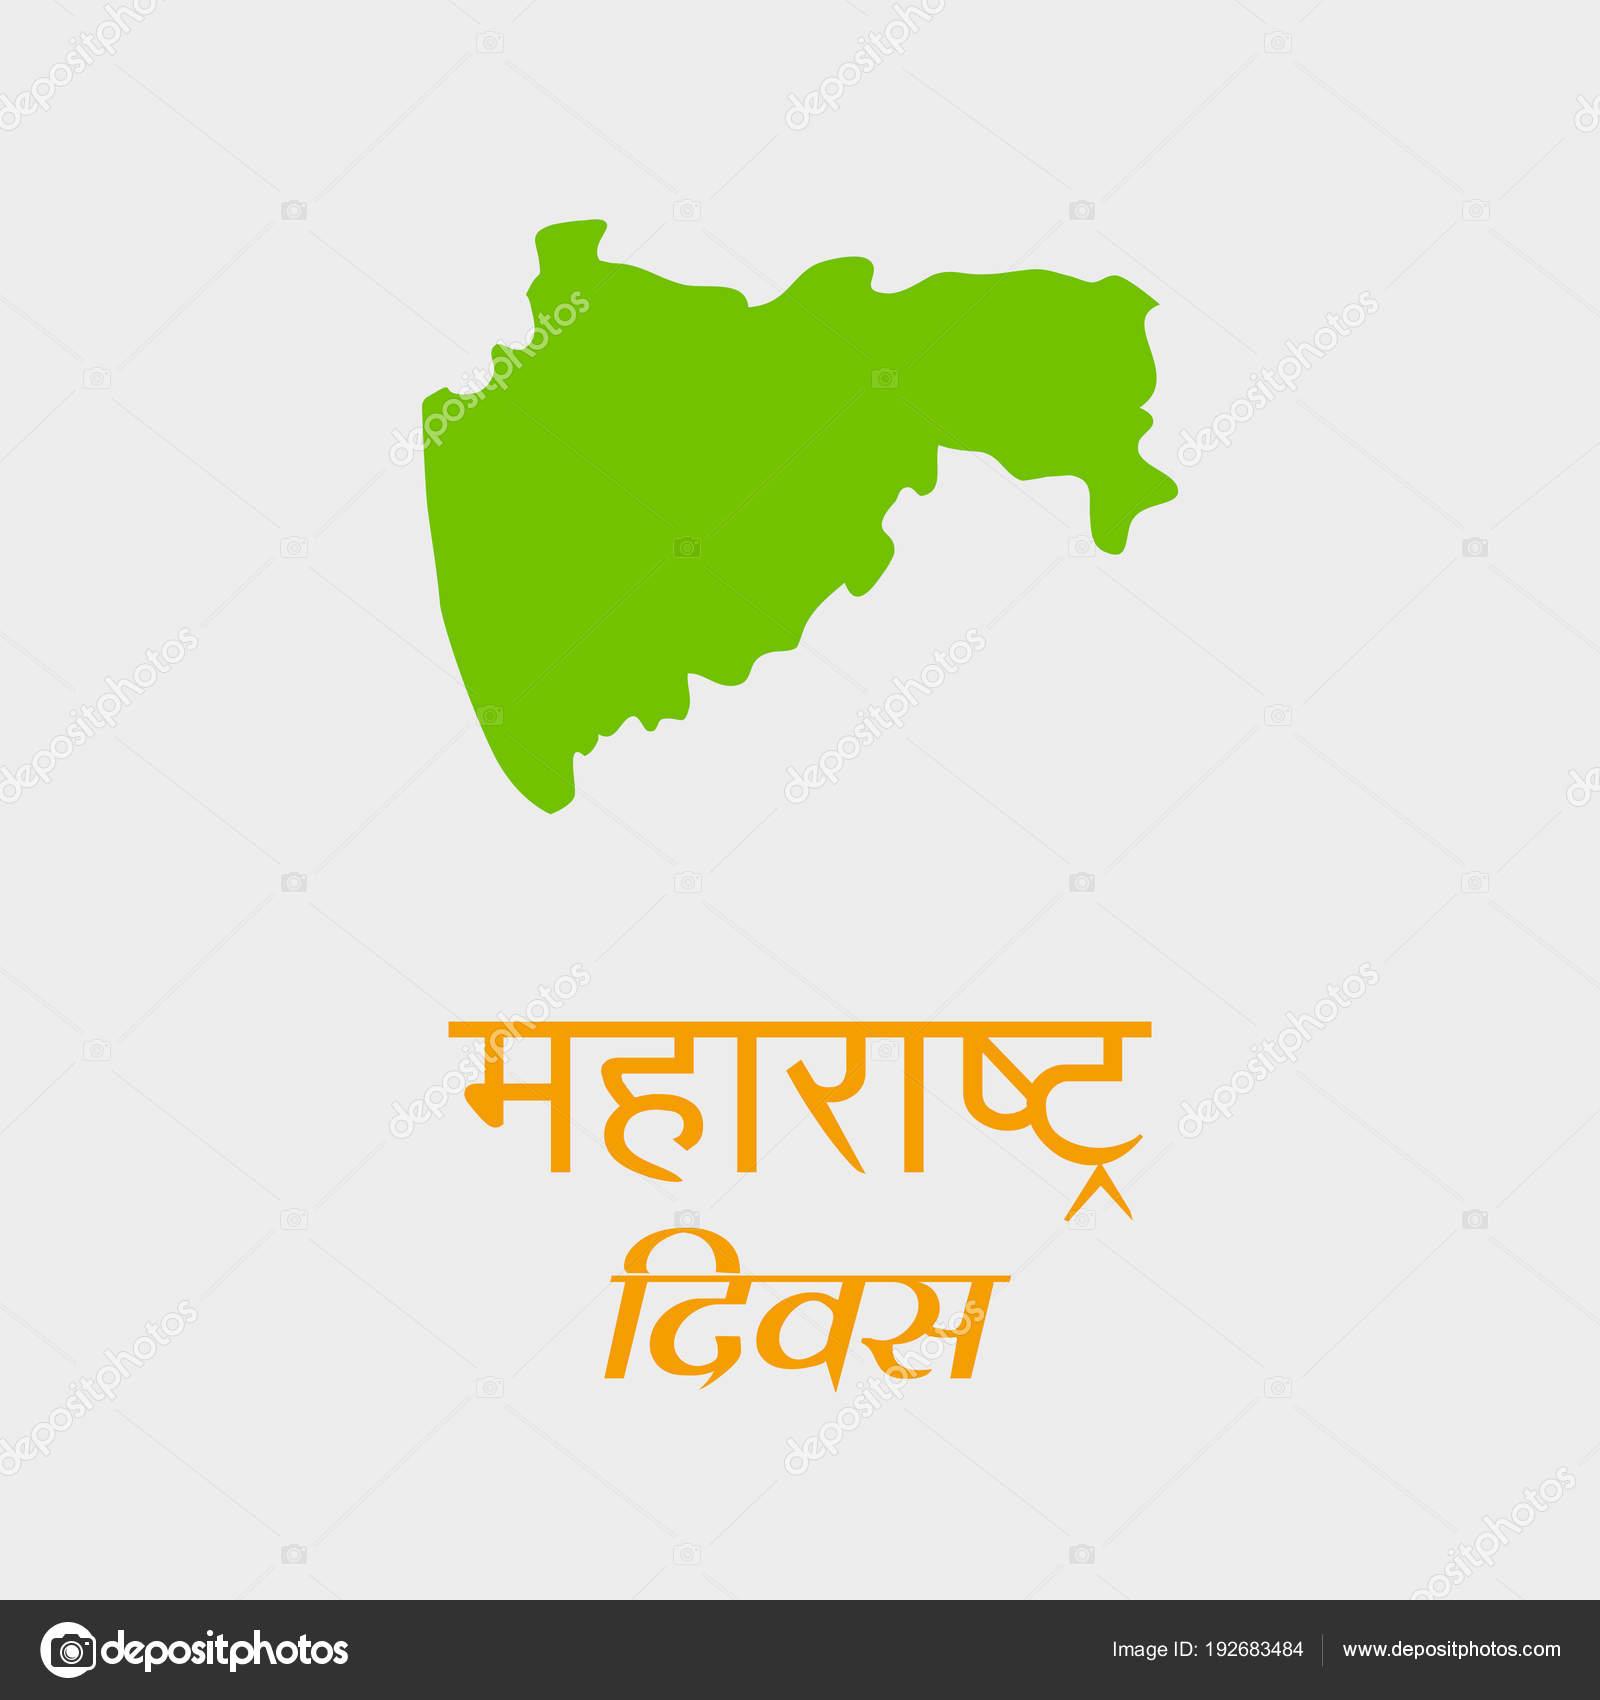 Ilustracin mapa indio estado maharashtra con texto hindi jai ilustracin mapa indio estado maharashtra con texto hindi jai maharashtra vector de stock gumiabroncs Choice Image